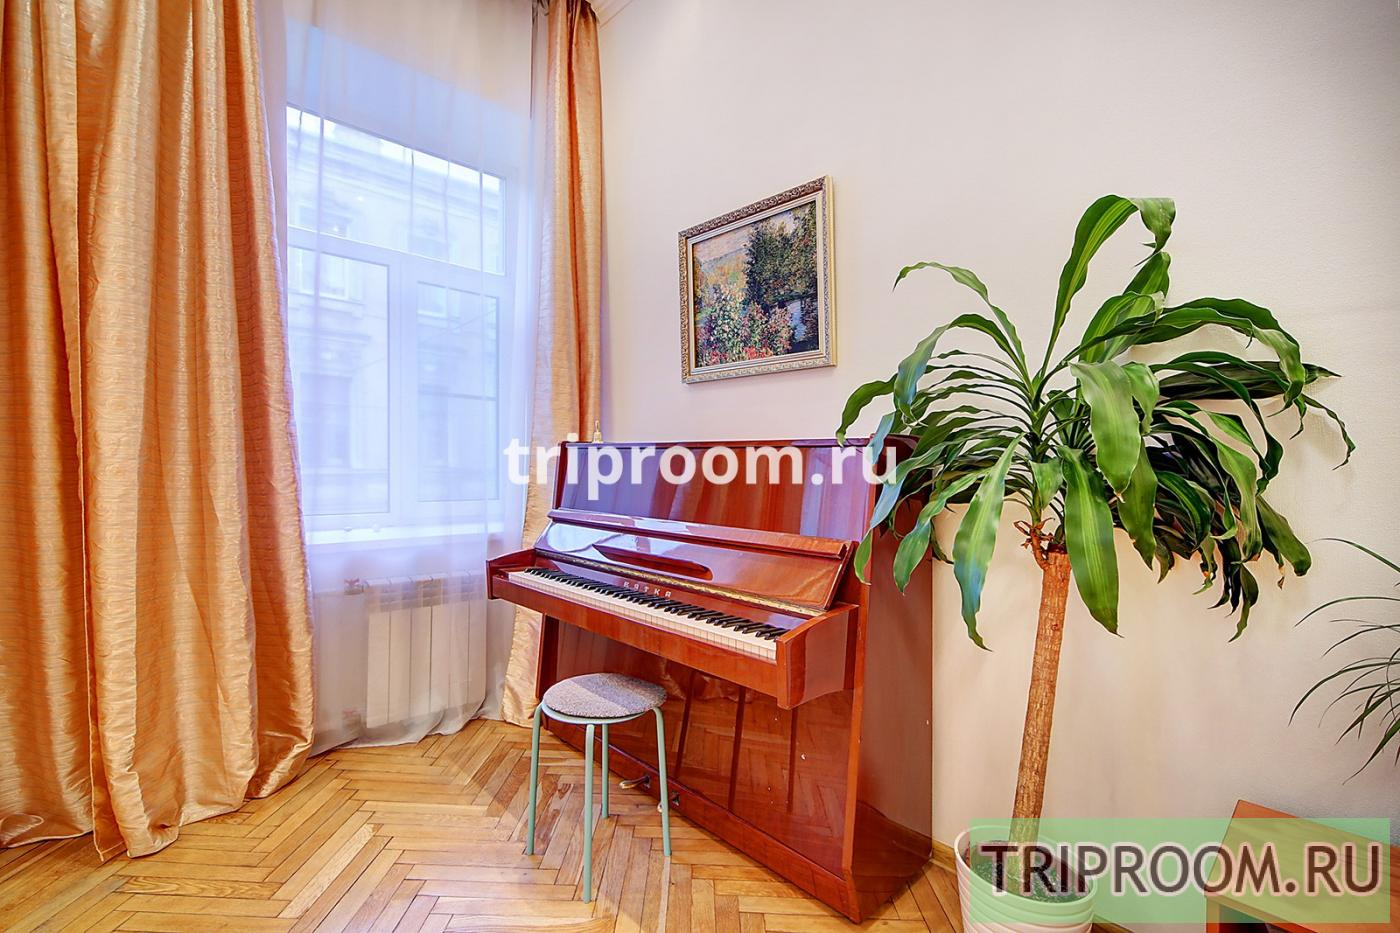 2-комнатная квартира посуточно (вариант № 15426), ул. Лиговский проспект, фото № 5